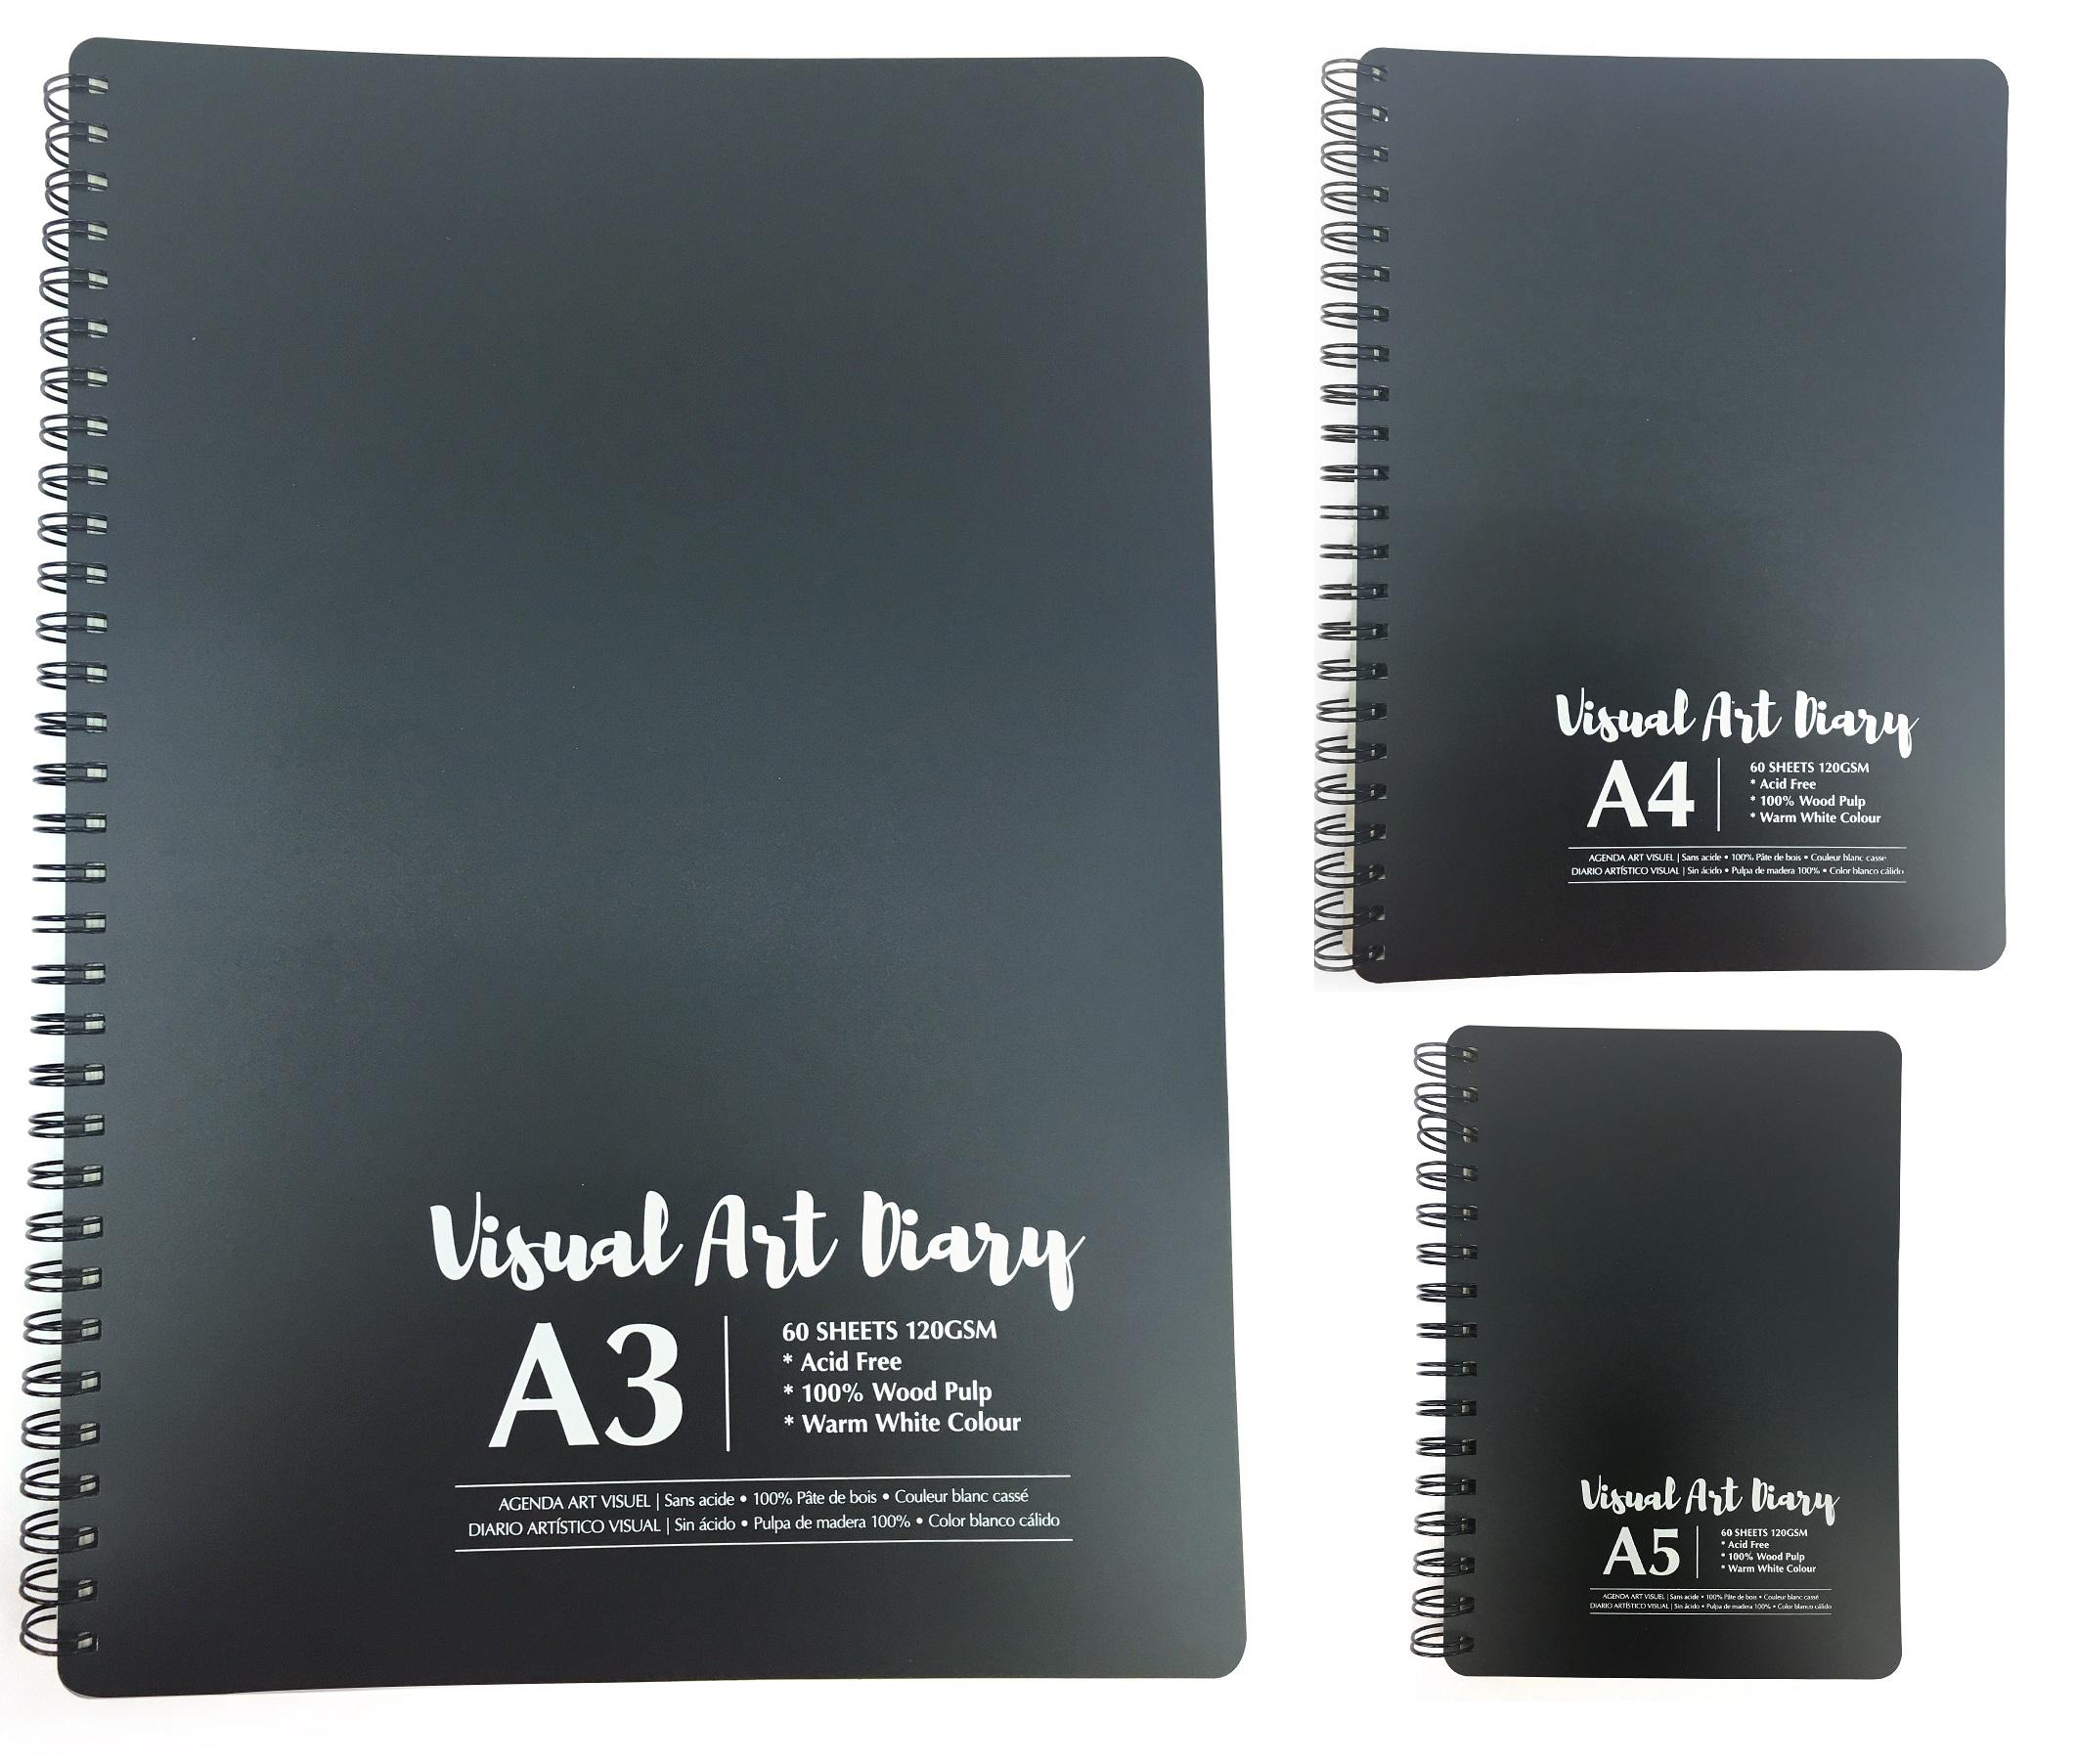 Details About Spiral Professional 120gsm A3 A4 A5 Art 60sheet Artist Draw Cartridge Sketch Pad